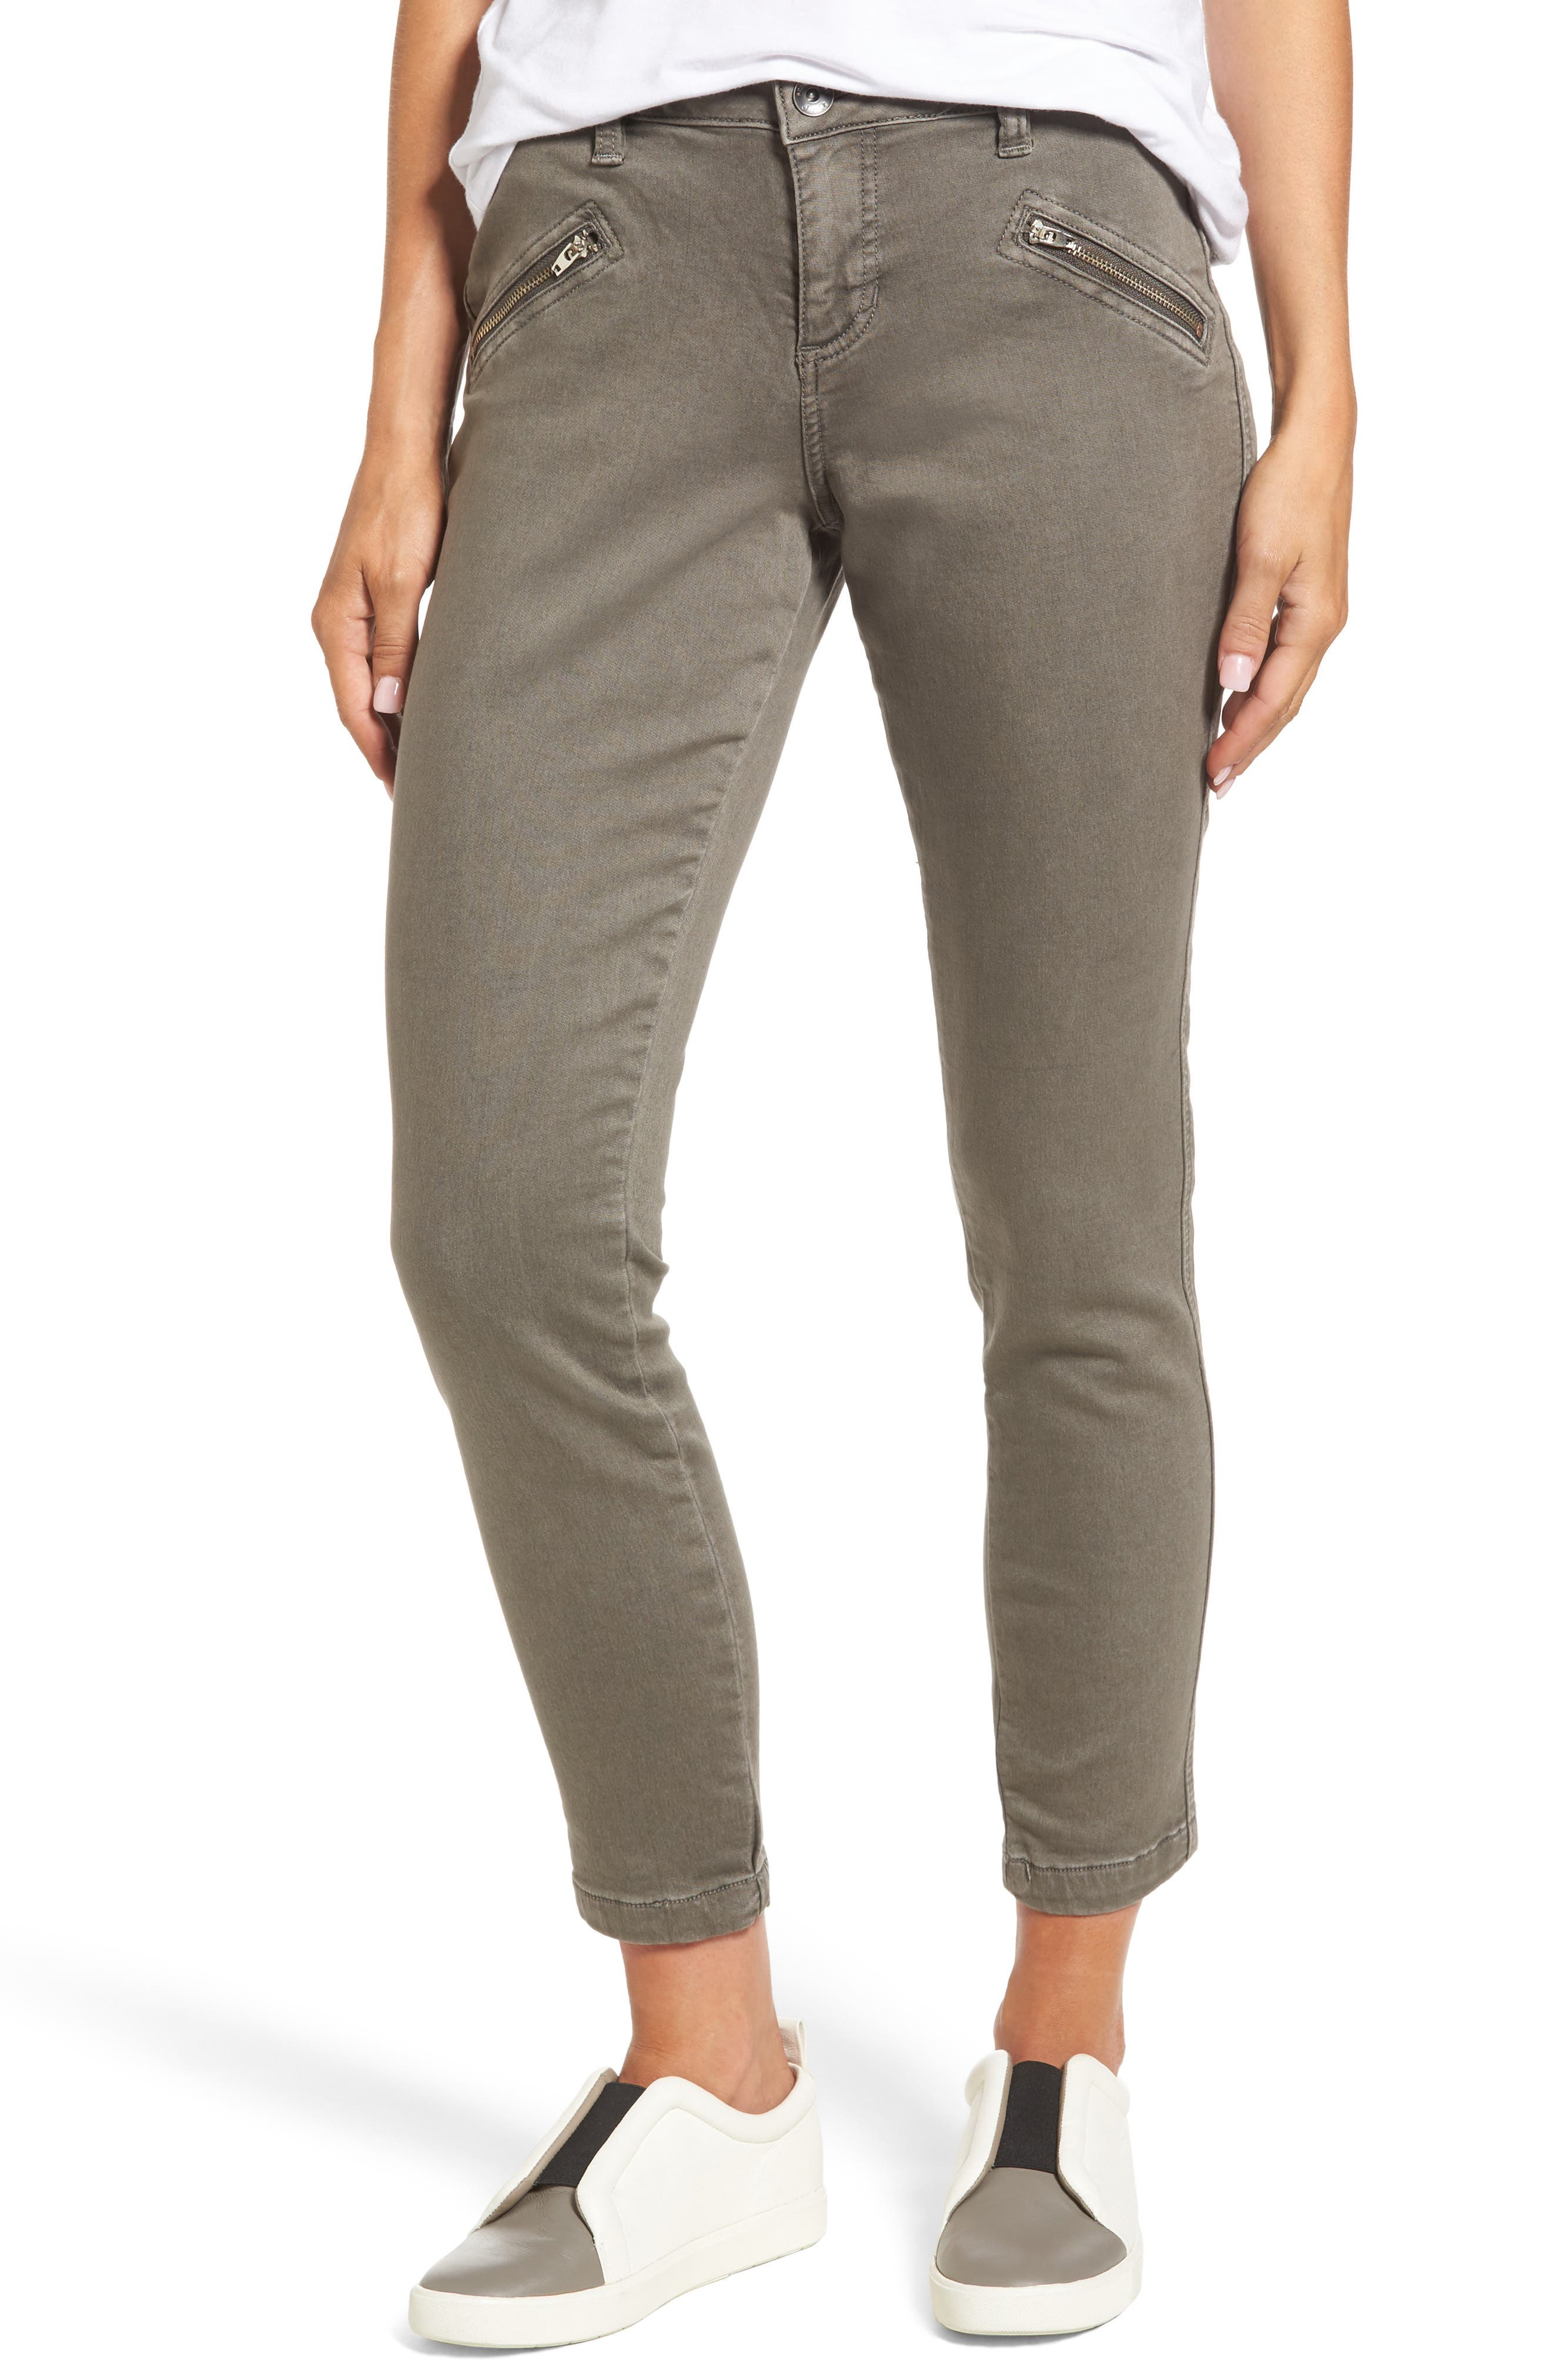 Ryan Knit Skinny Jeans,                         Main,                         color, Lava Rock